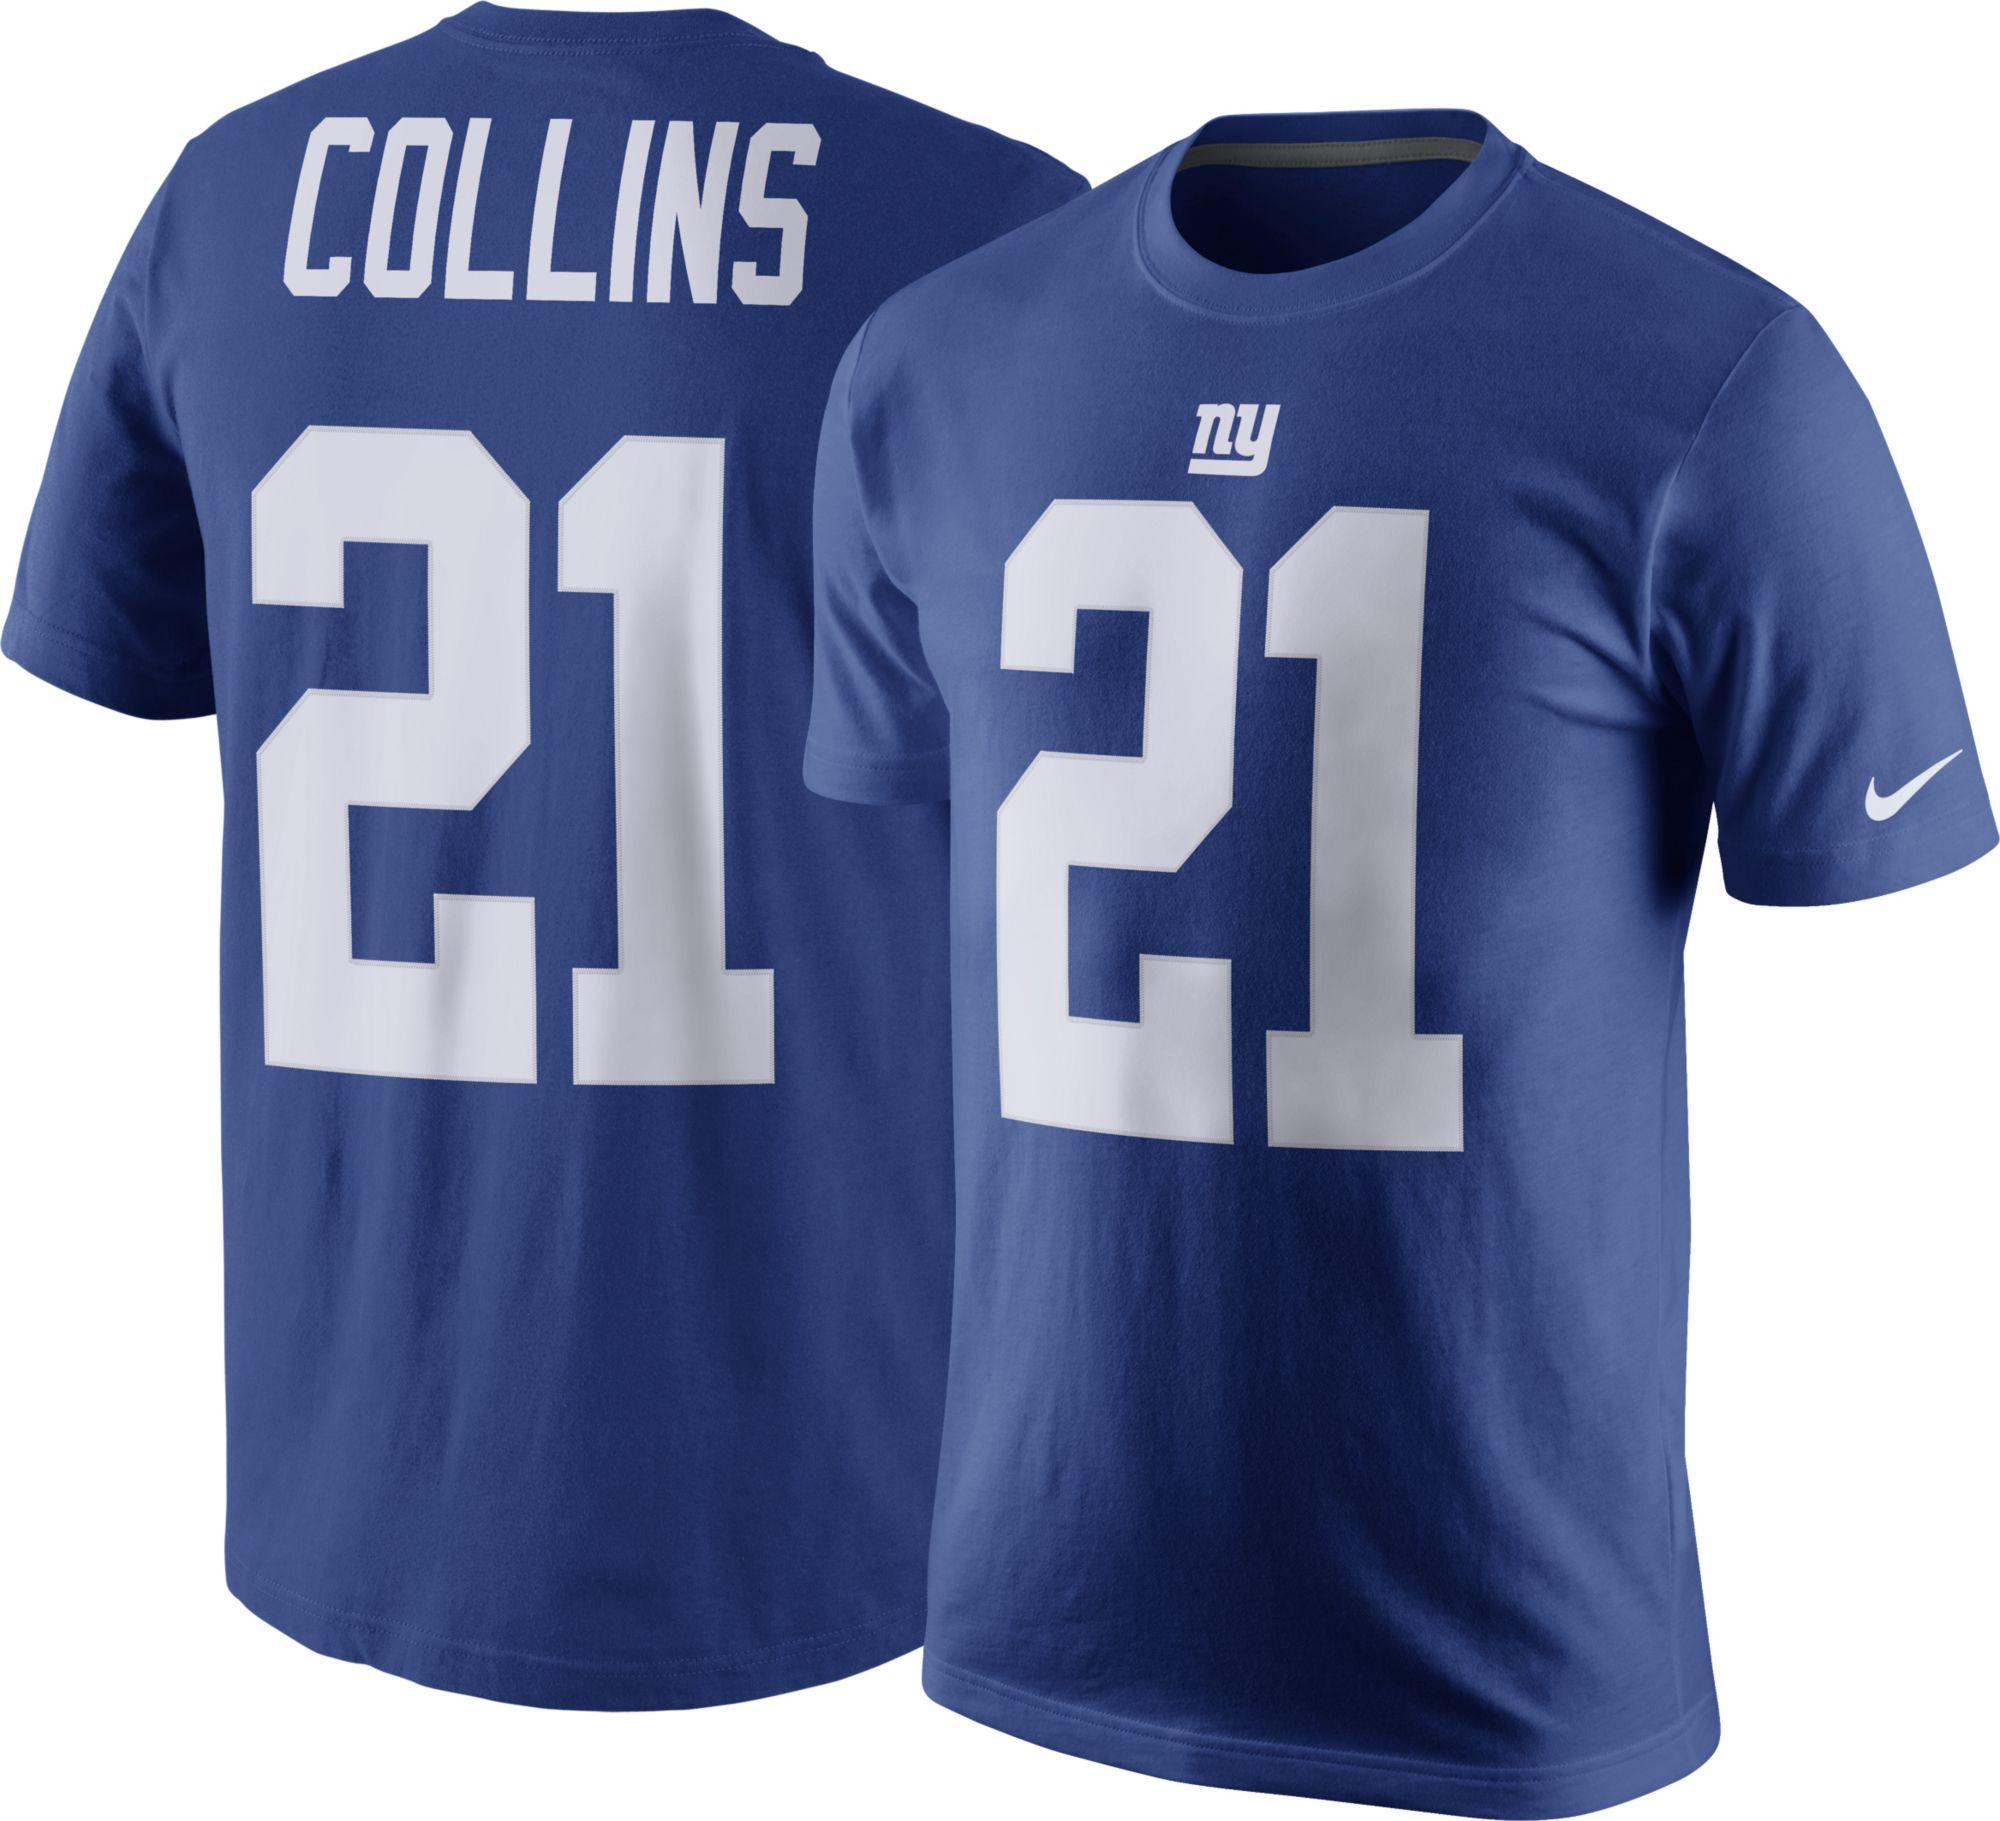 Nike Men s New York Giants Landon Collins 21 Pride Blue T Shirt